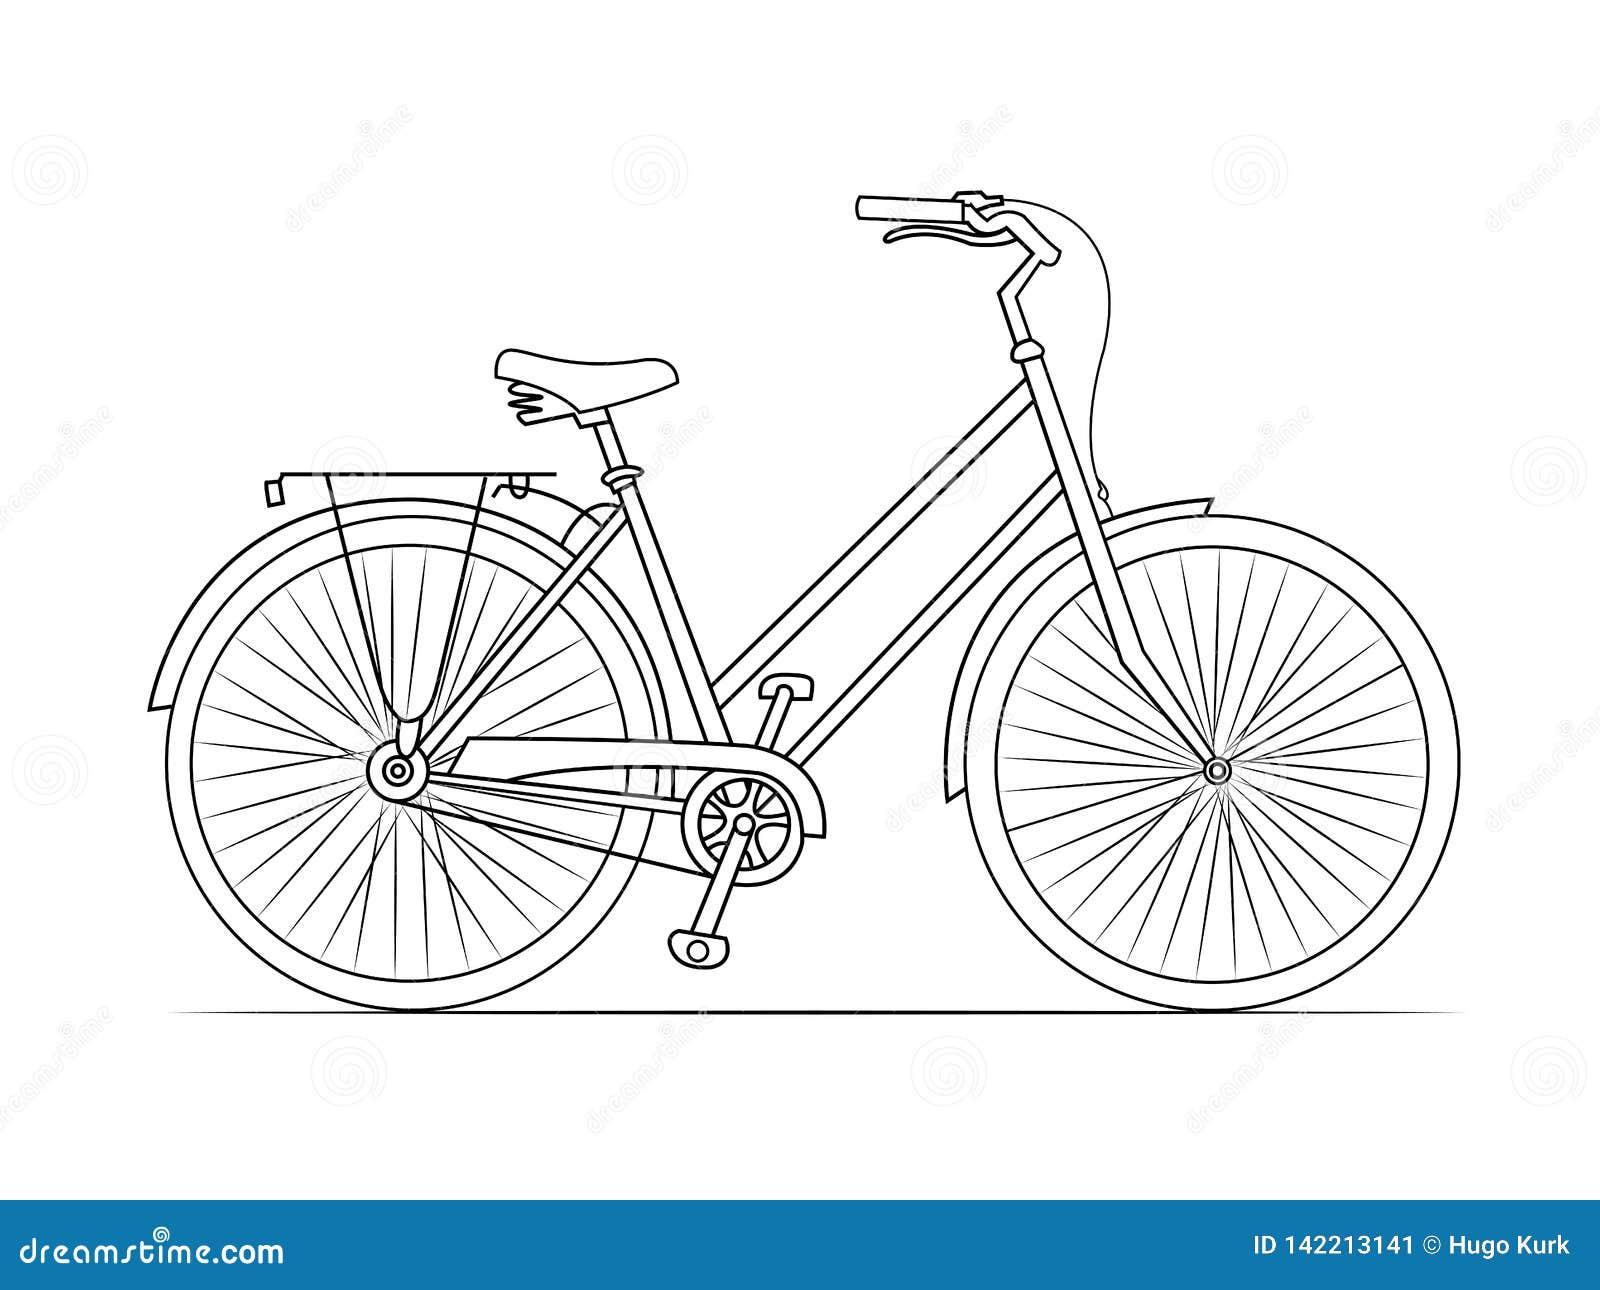 Línea bosquejo de la bicicleta